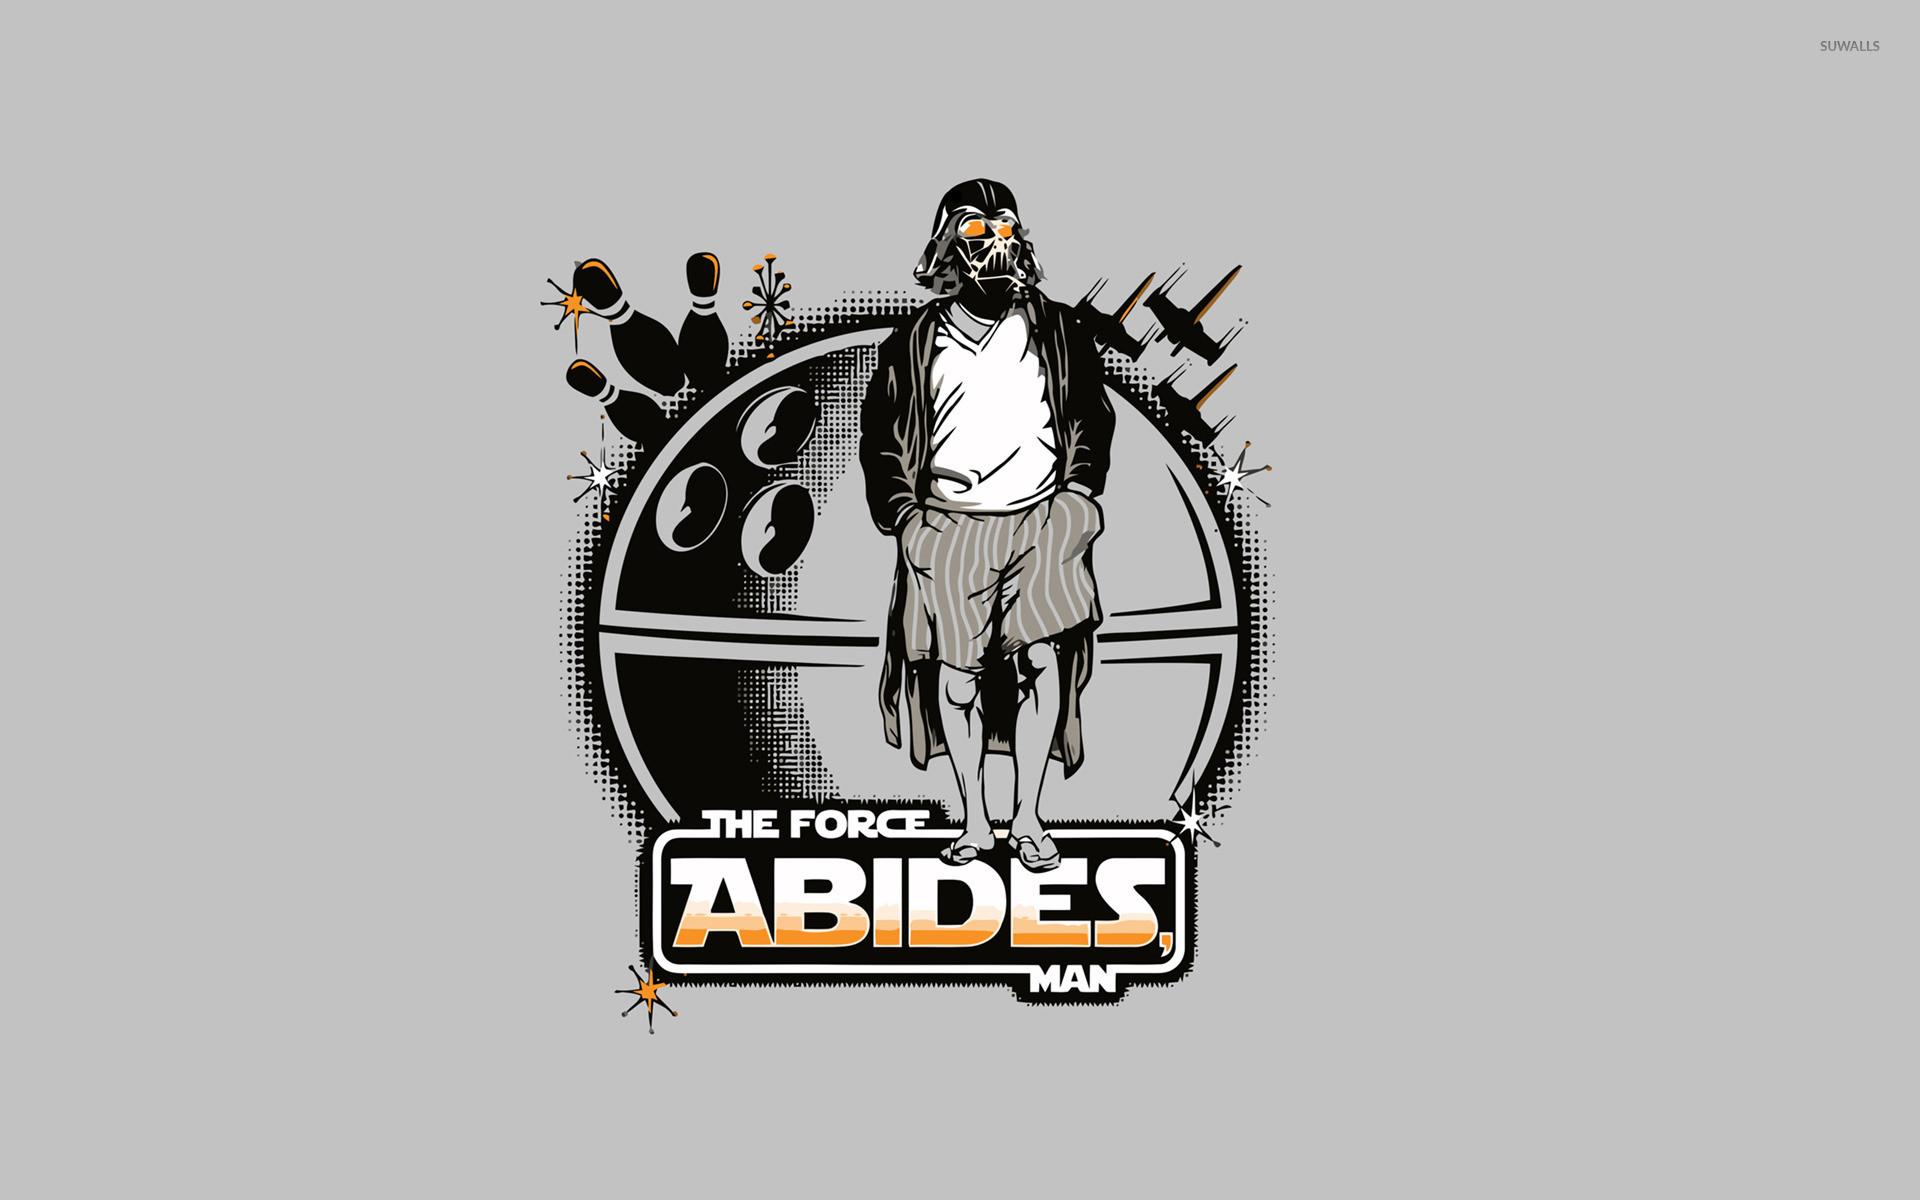 The Force Abides, Man wallpaper jpg